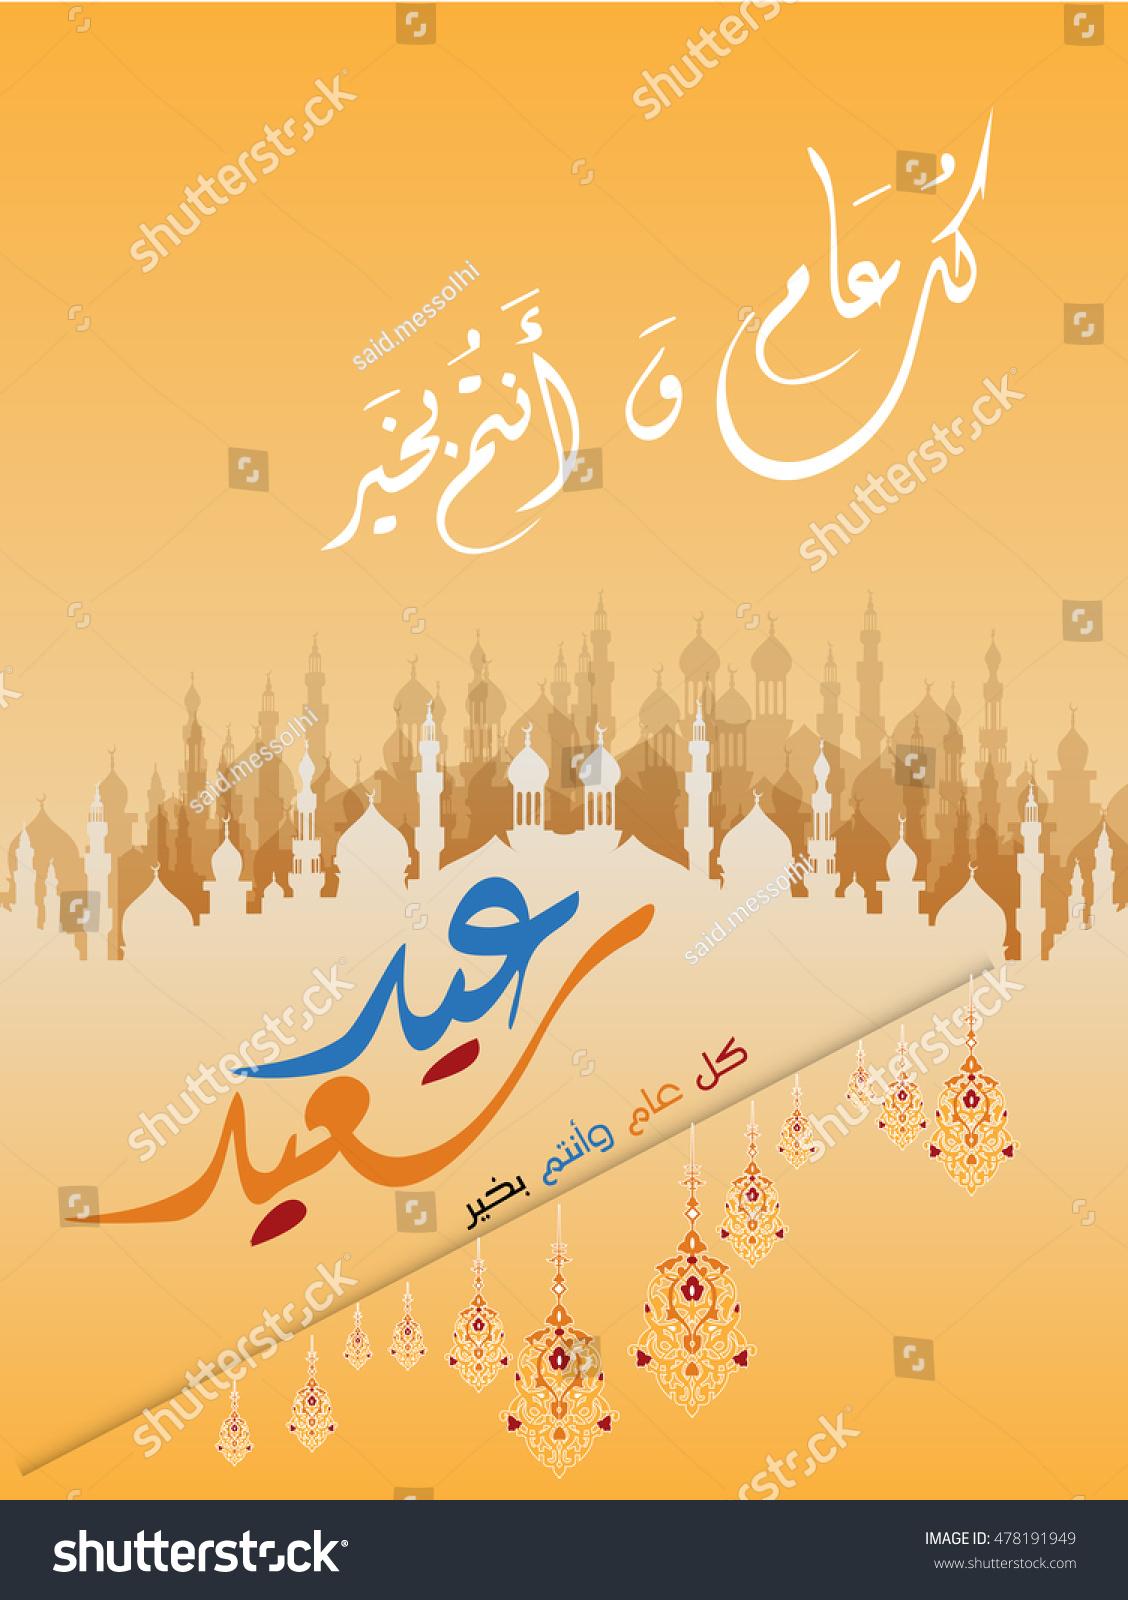 Eid Mubarak Wishes Image 2016 Eid Stock Vector Royalty Free